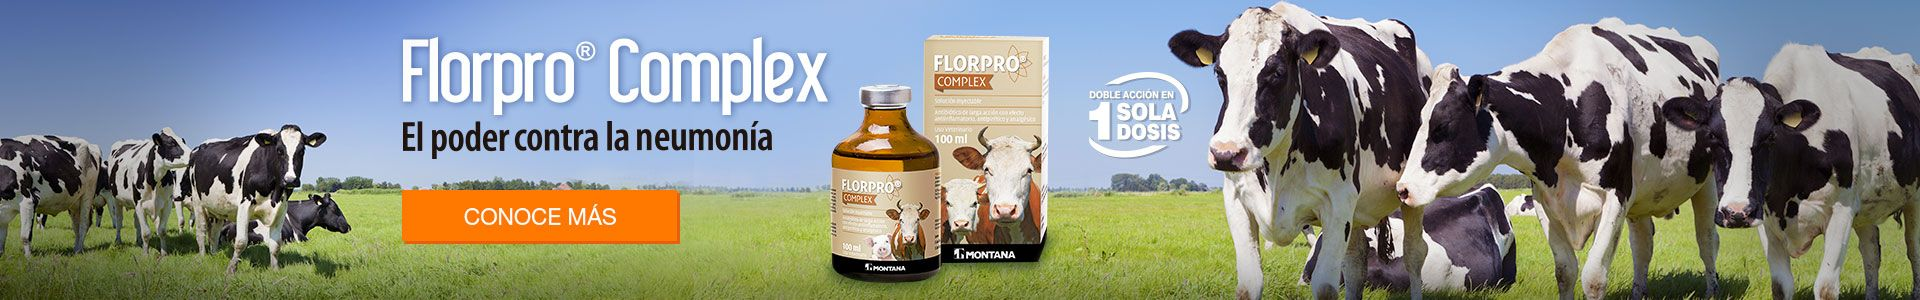 Banner-int-Florpro_Complex